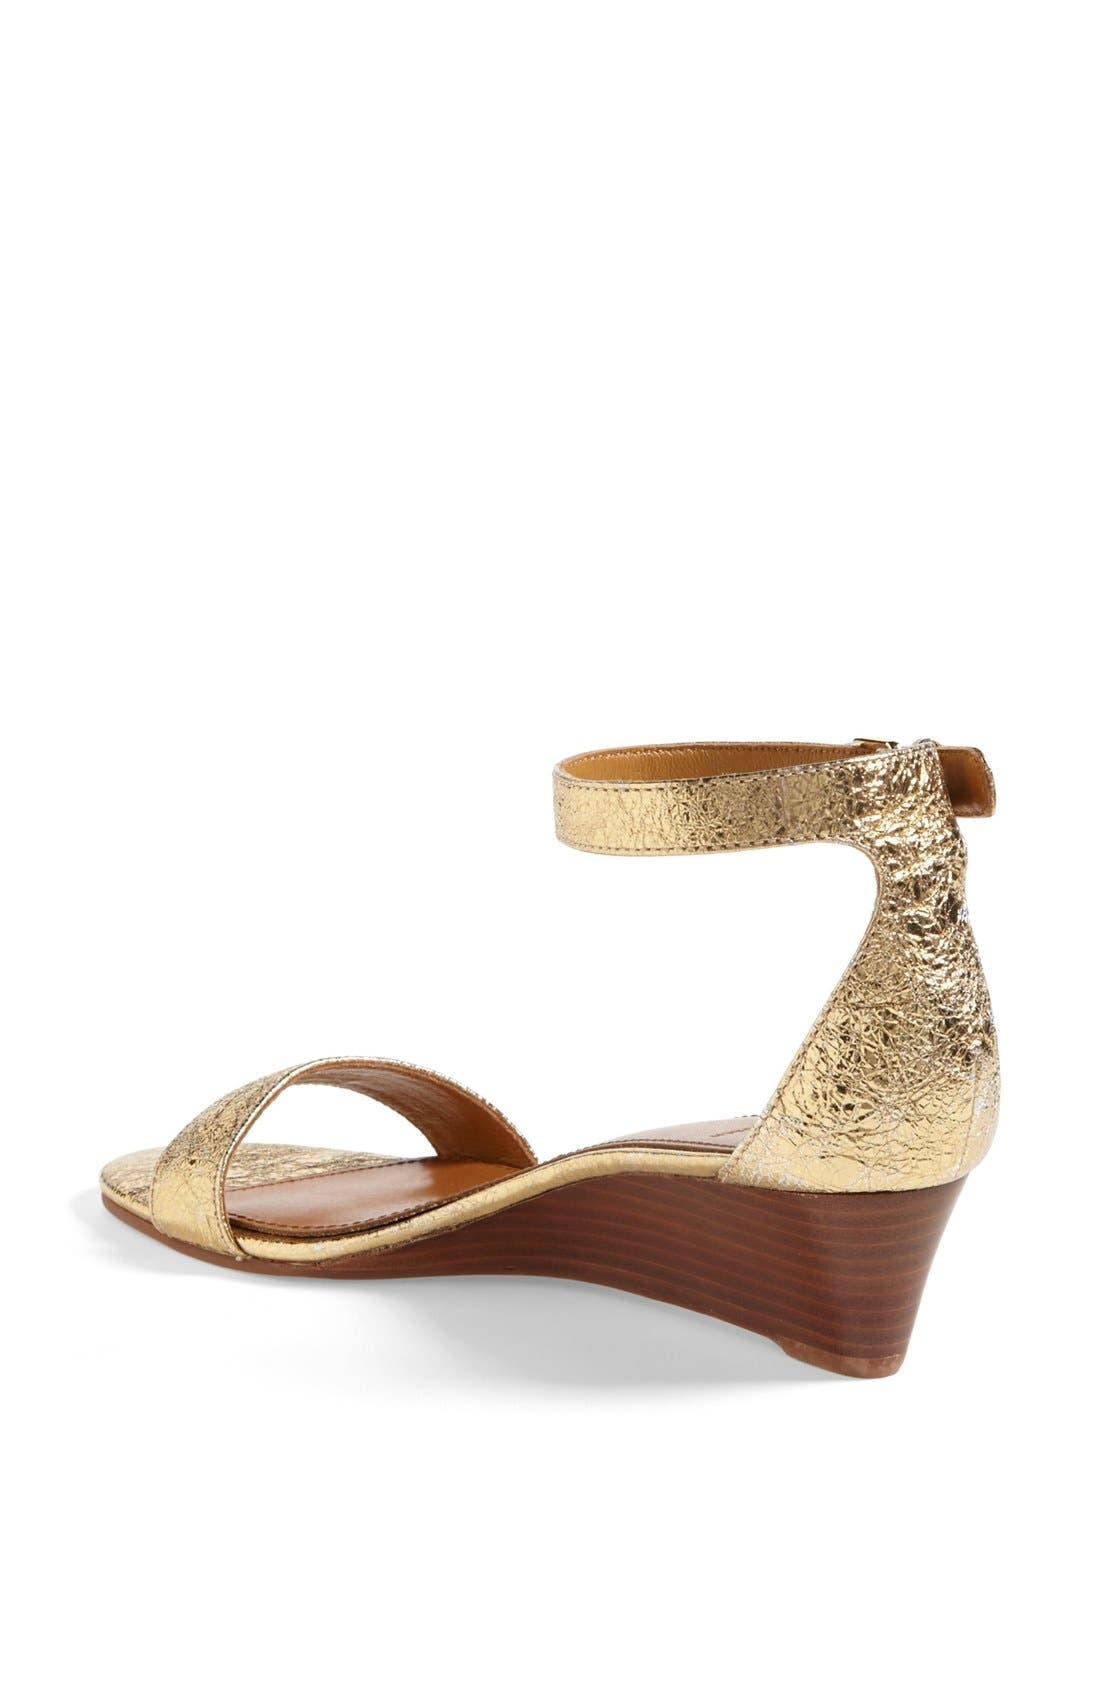 'Savannah' Wedge Sandal,                             Alternate thumbnail 2, color,                             Gold